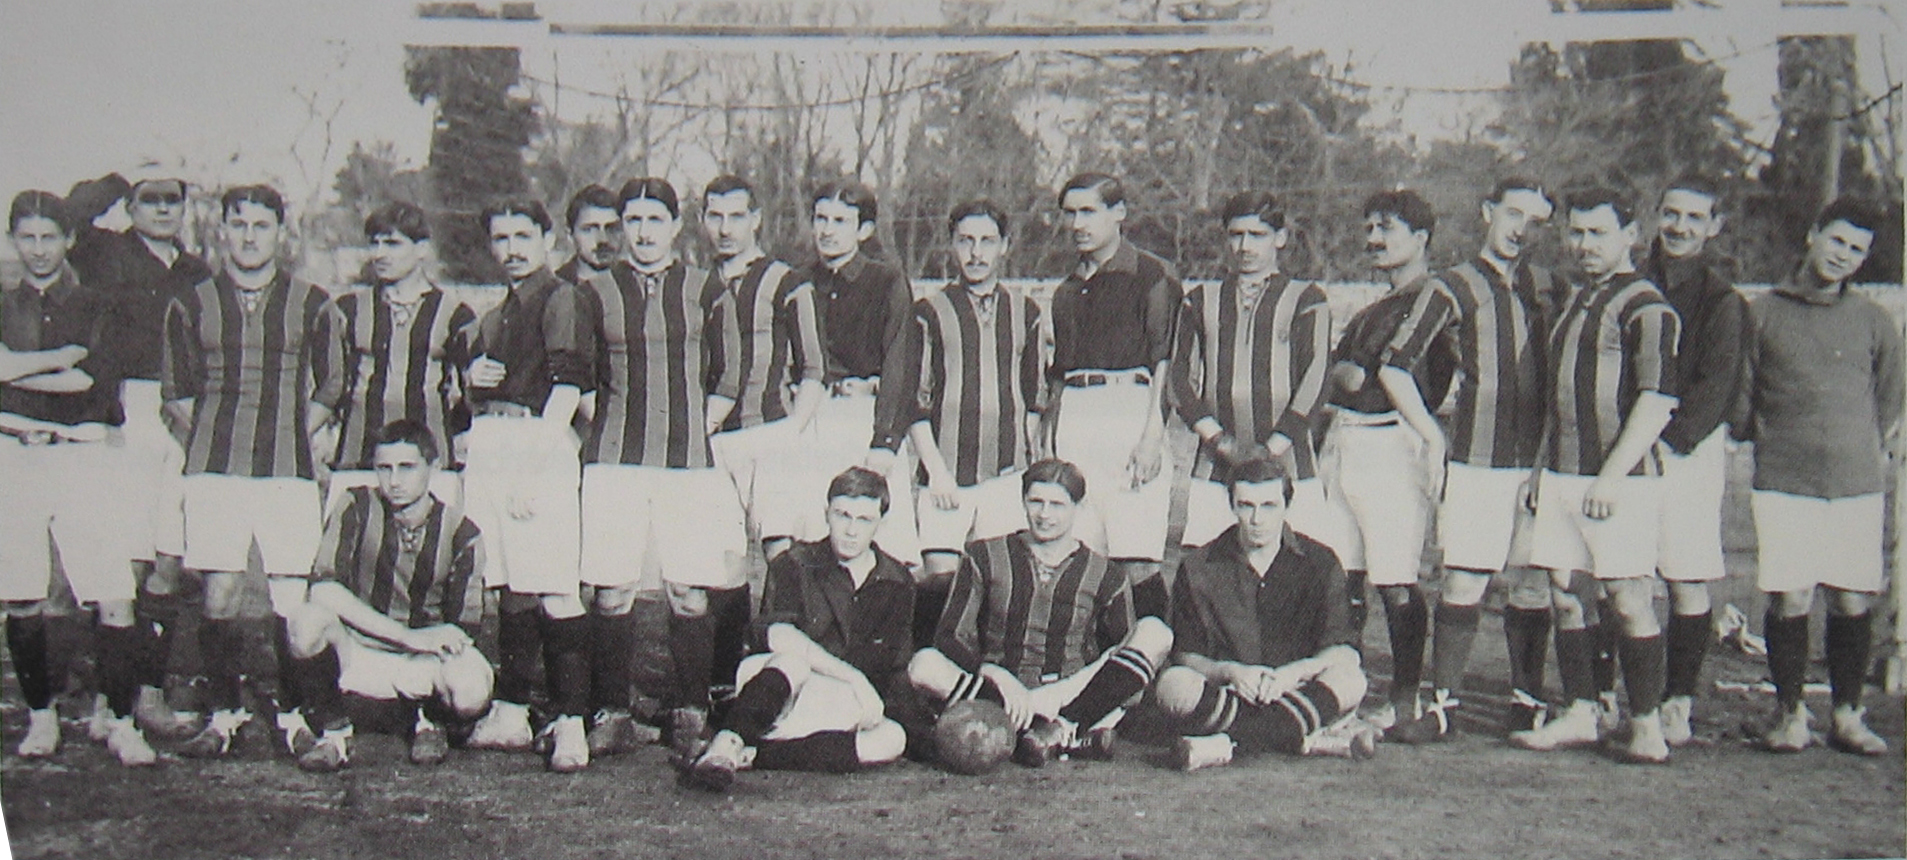 https://upload.wikimedia.org/wikipedia/commons/c/c2/Galatasaray-Fenerbah%C3%A7e_1913-14.jpg